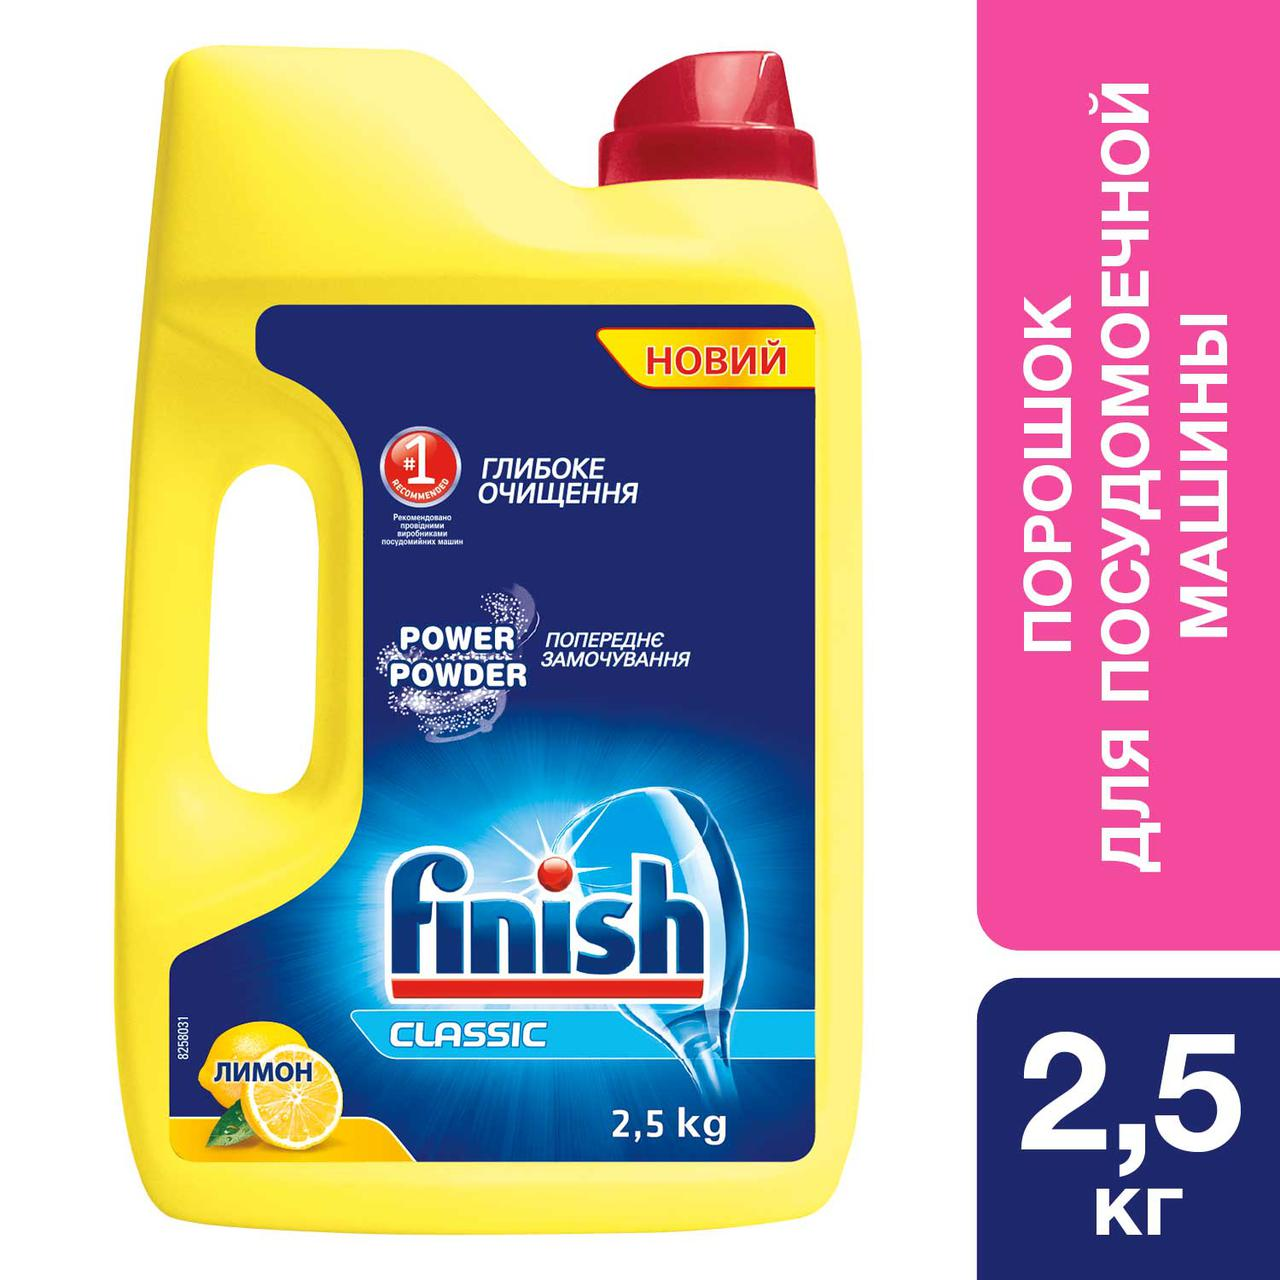 Порошок для миття посуду в посудомийних машинах FINISH 2,5 кг з ароматом лимона